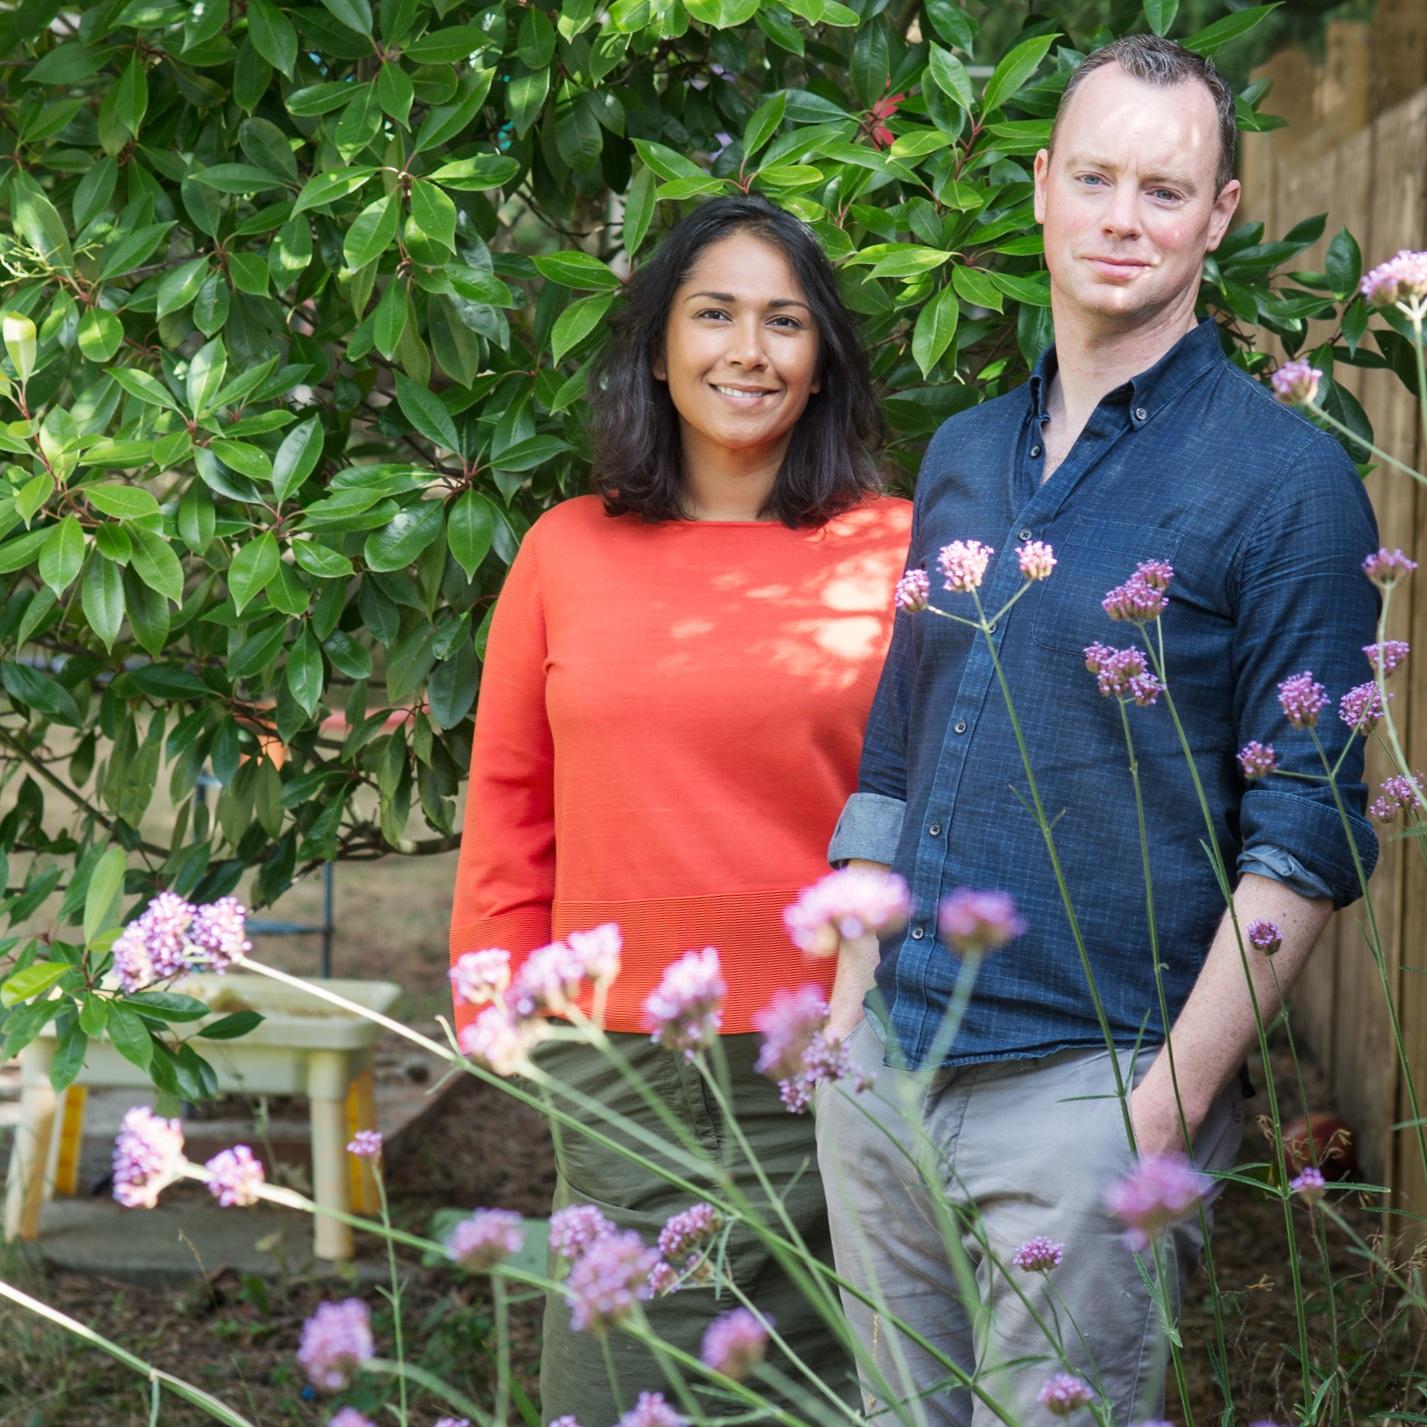 Zaffrin+and+Brian+Square+Web+Garden.jpg